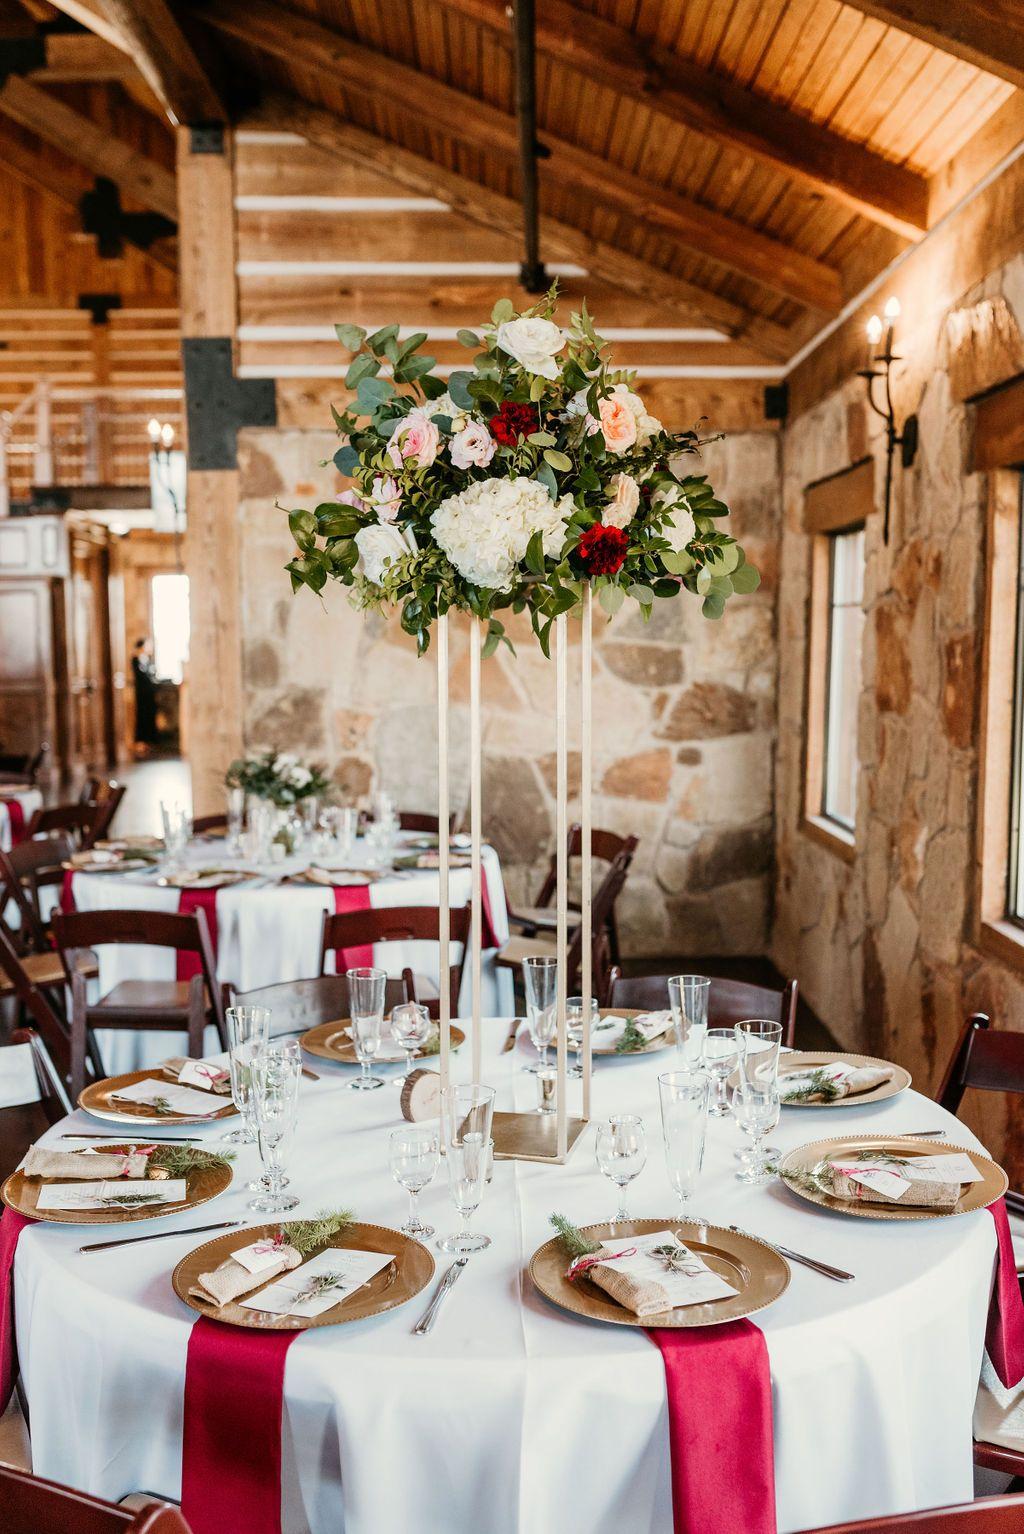 Lodge Wedding Venue In Denton Texas In 2020 Lodge Wedding